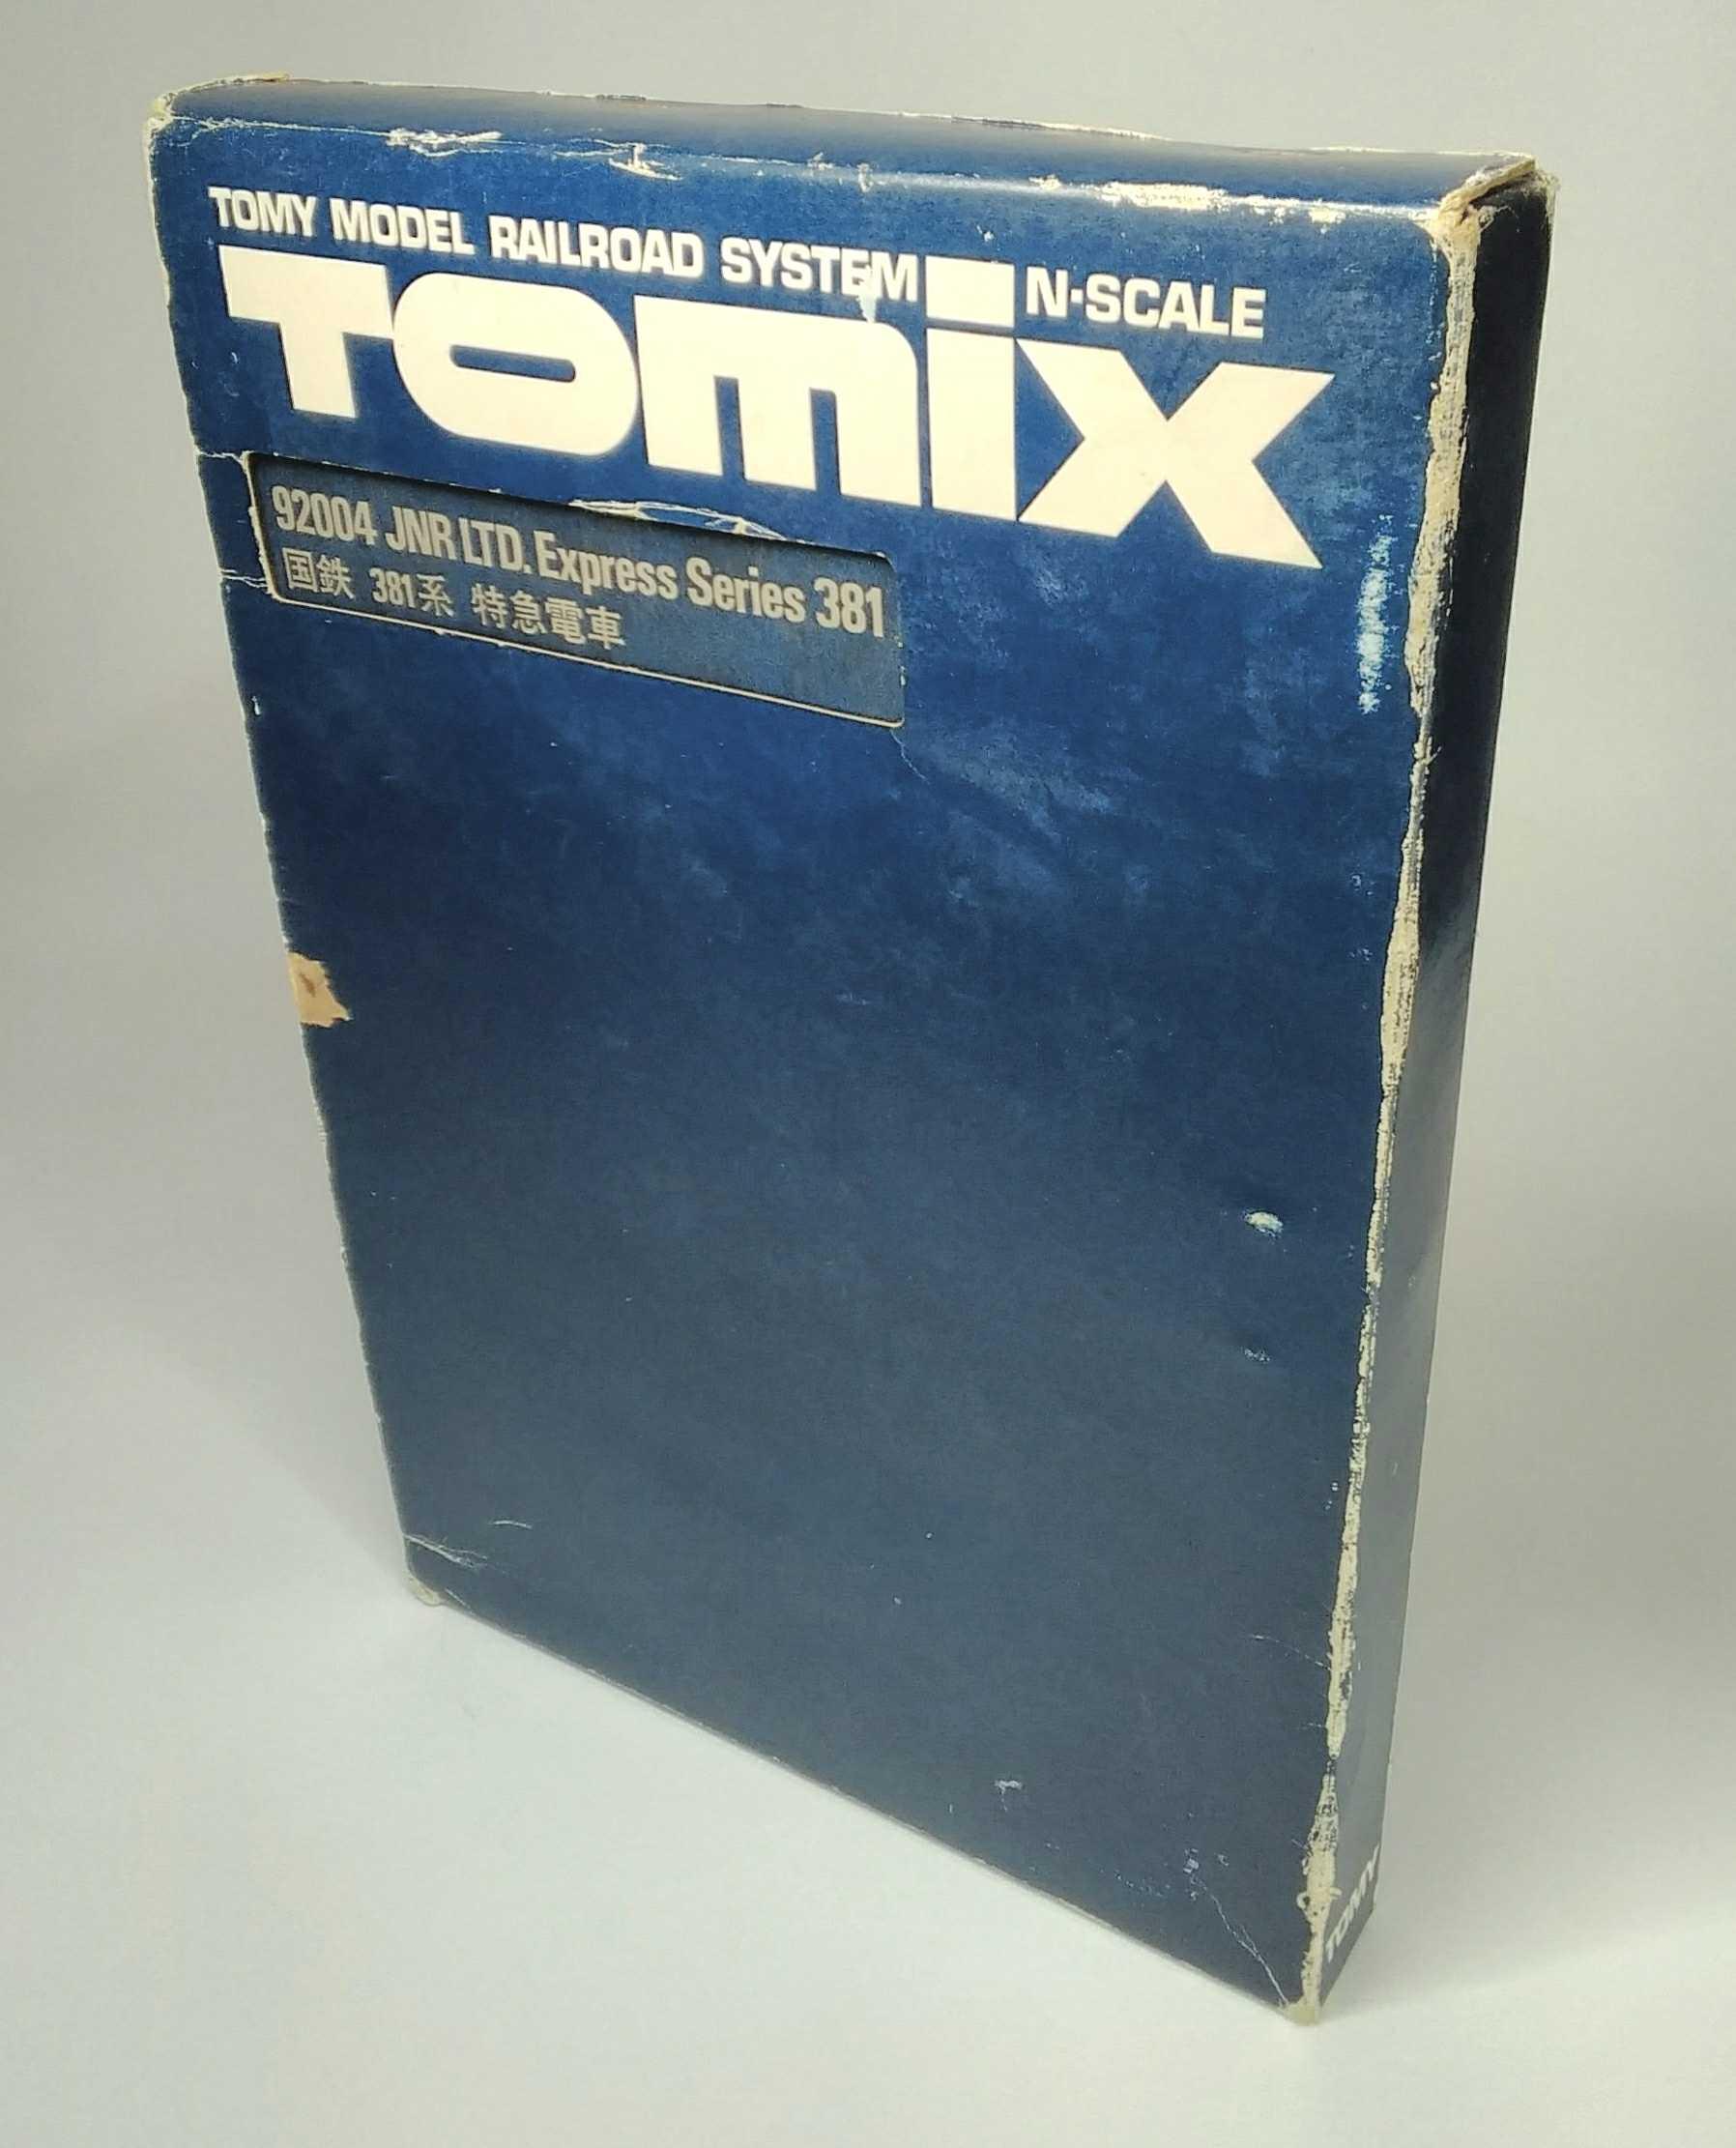 JNRLTD EXPRESS SERIES 381|TOMIX